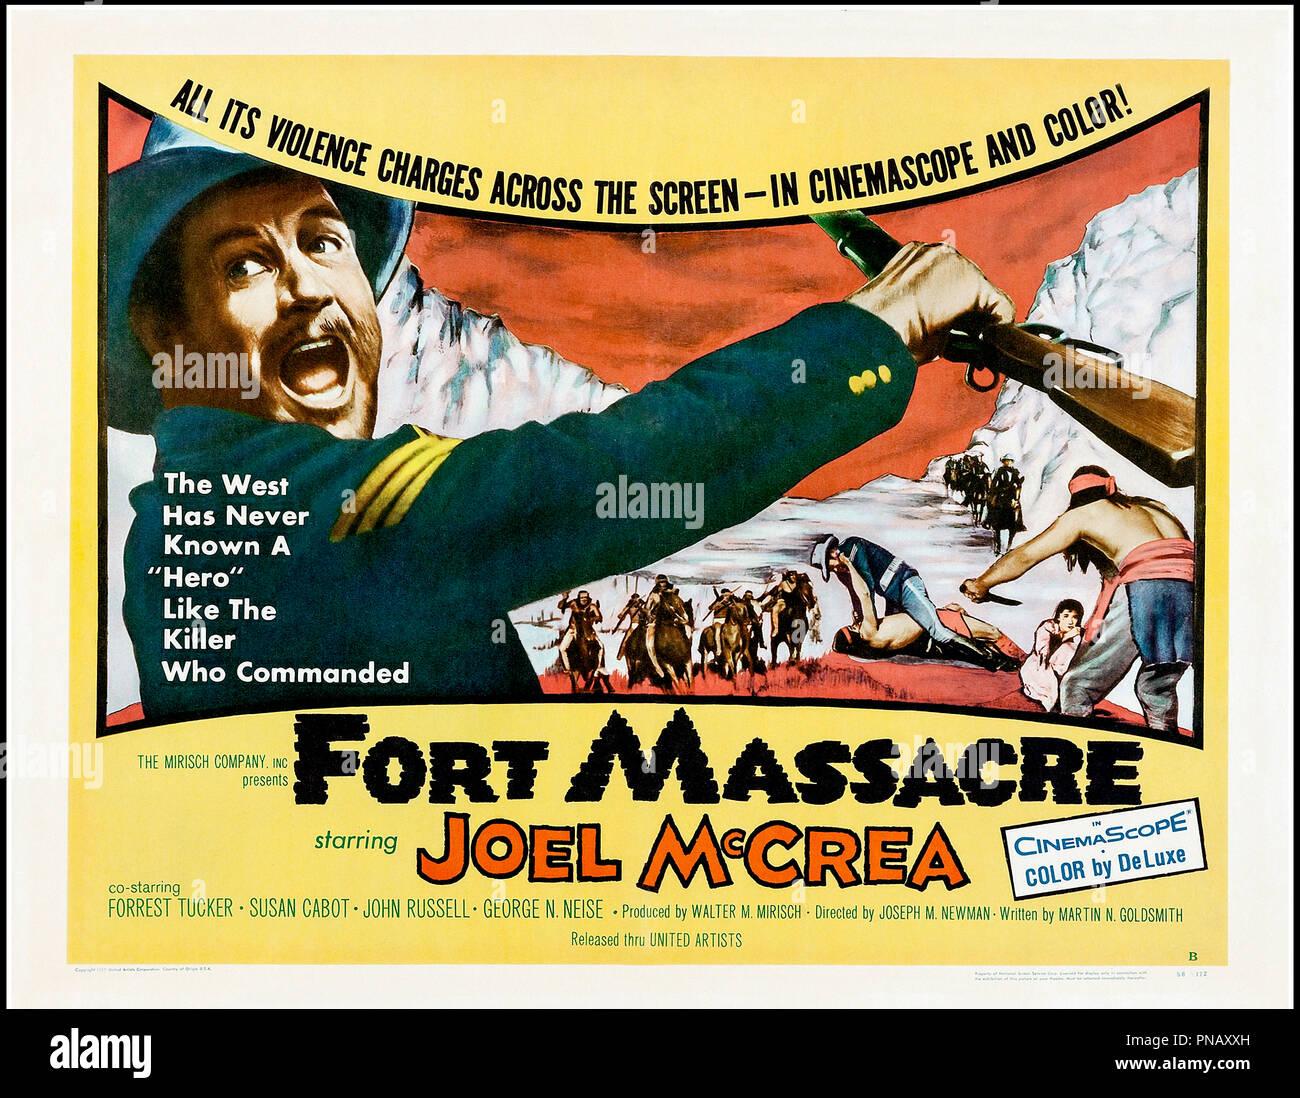 Joel Mc Crea Imágenes De Stock & Joel Mc Crea Fotos De Stock - Alamy